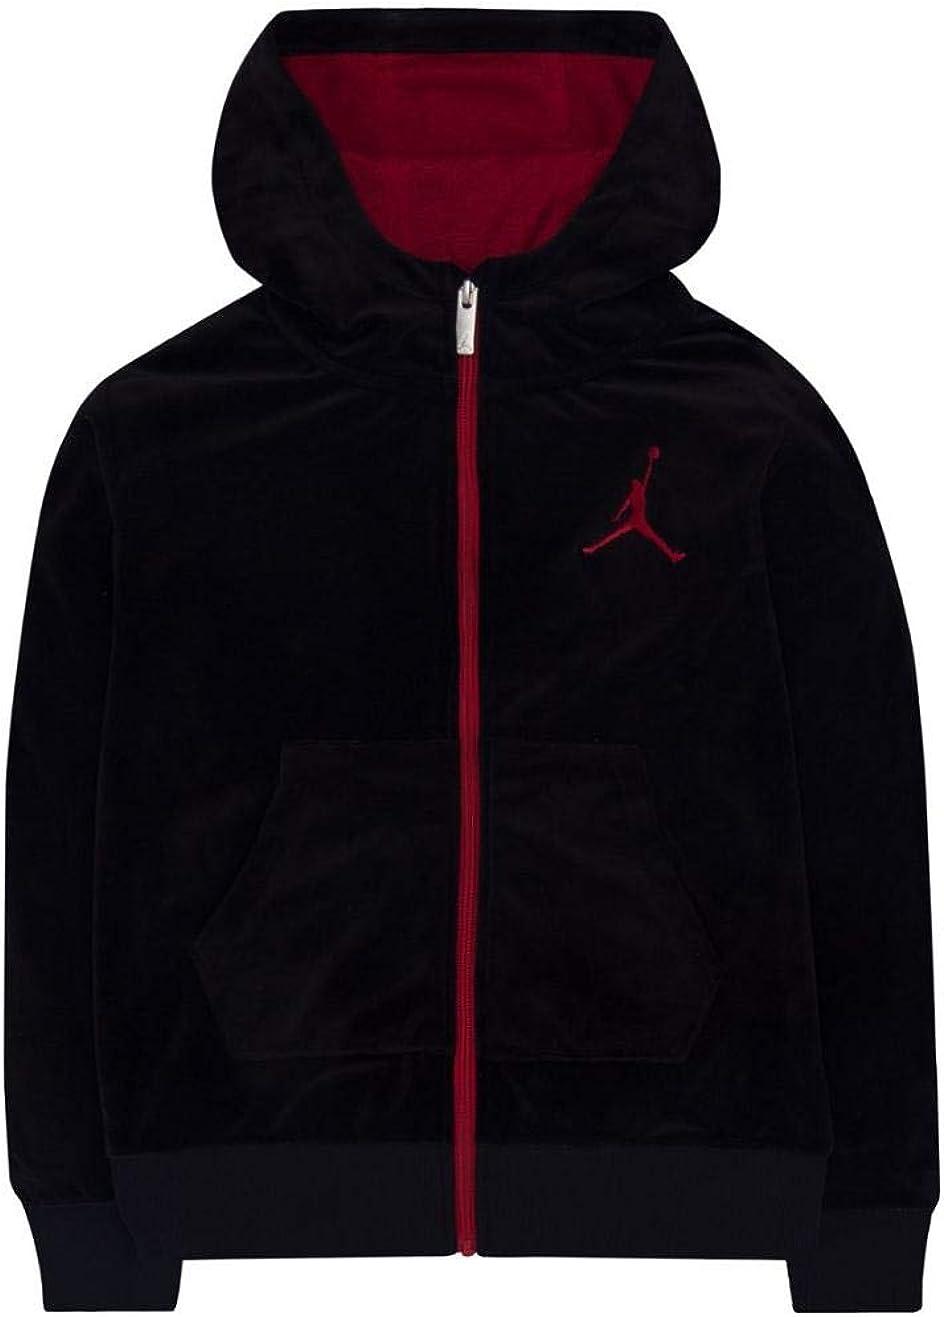 Nike Air Jordan Boys Velour Zipper Hoodie (Black, Large)